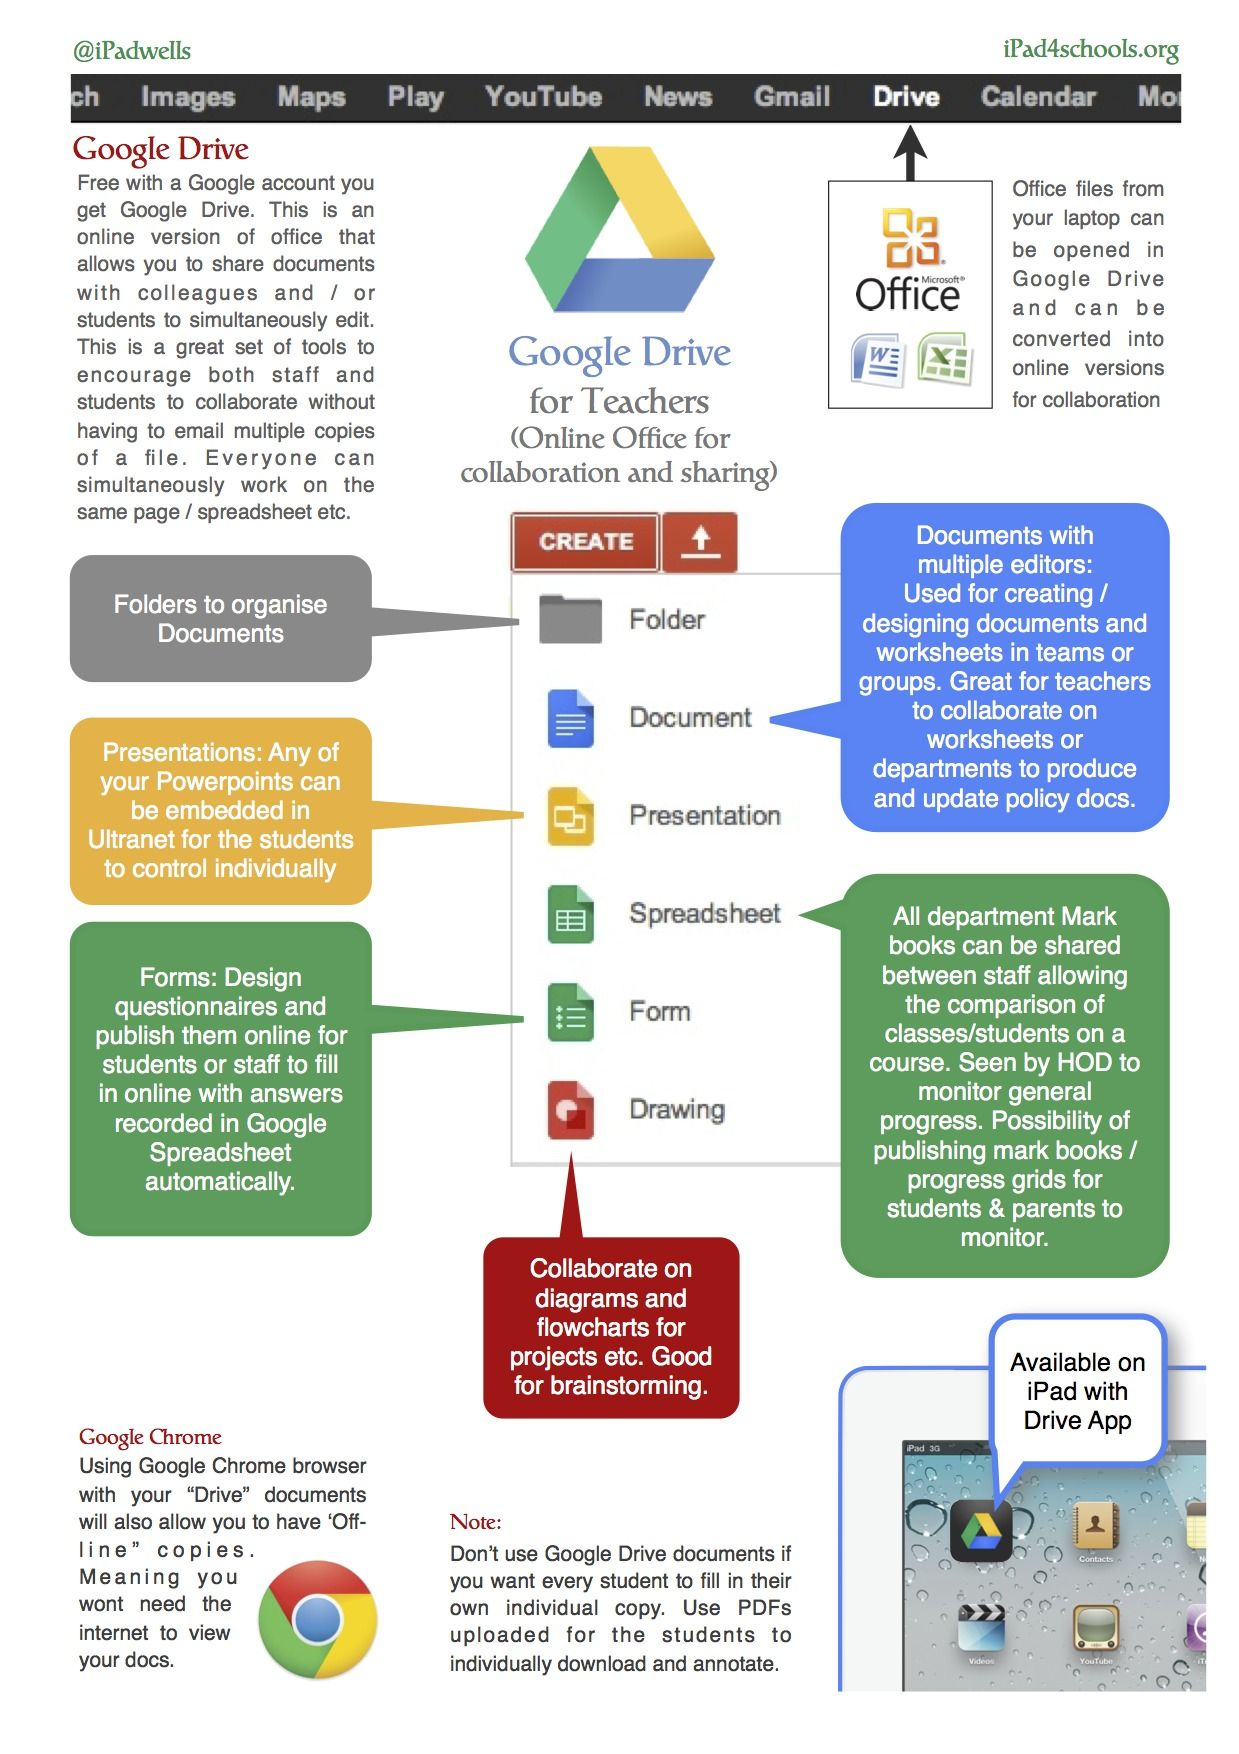 Google Drive Para Profes Aprender Y Educar Google Education Teacher Technology Teaching Technology